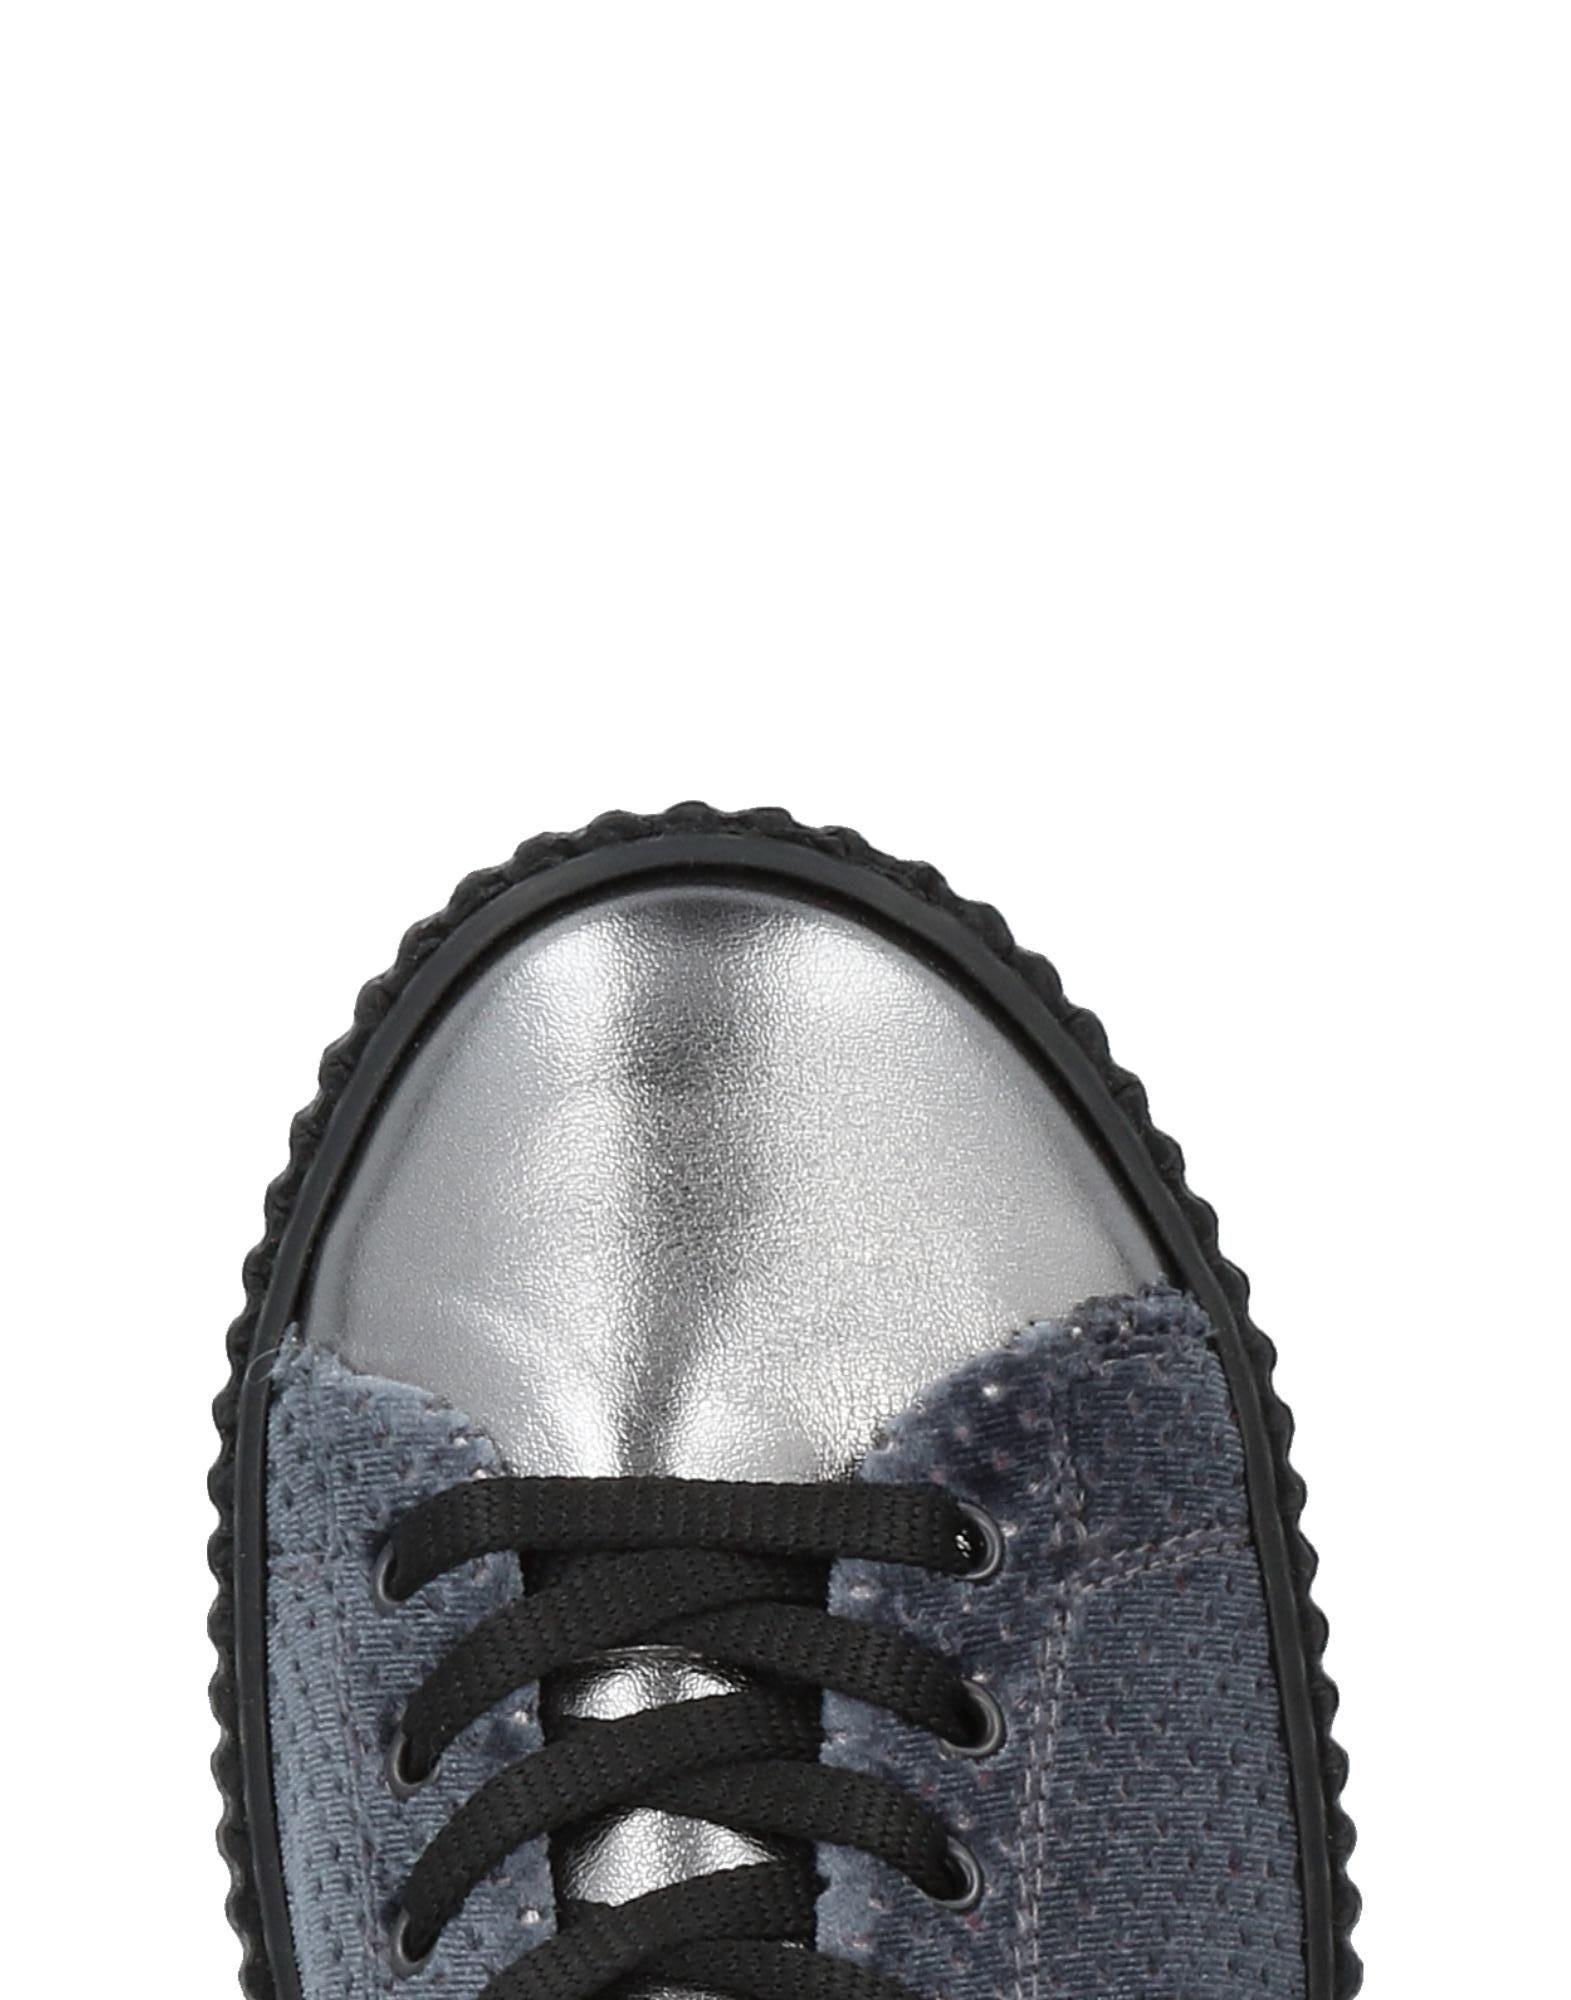 Oroscuro Gute Sneakers Damen  11456408FX Gute Oroscuro Qualität beliebte Schuhe 705b7c